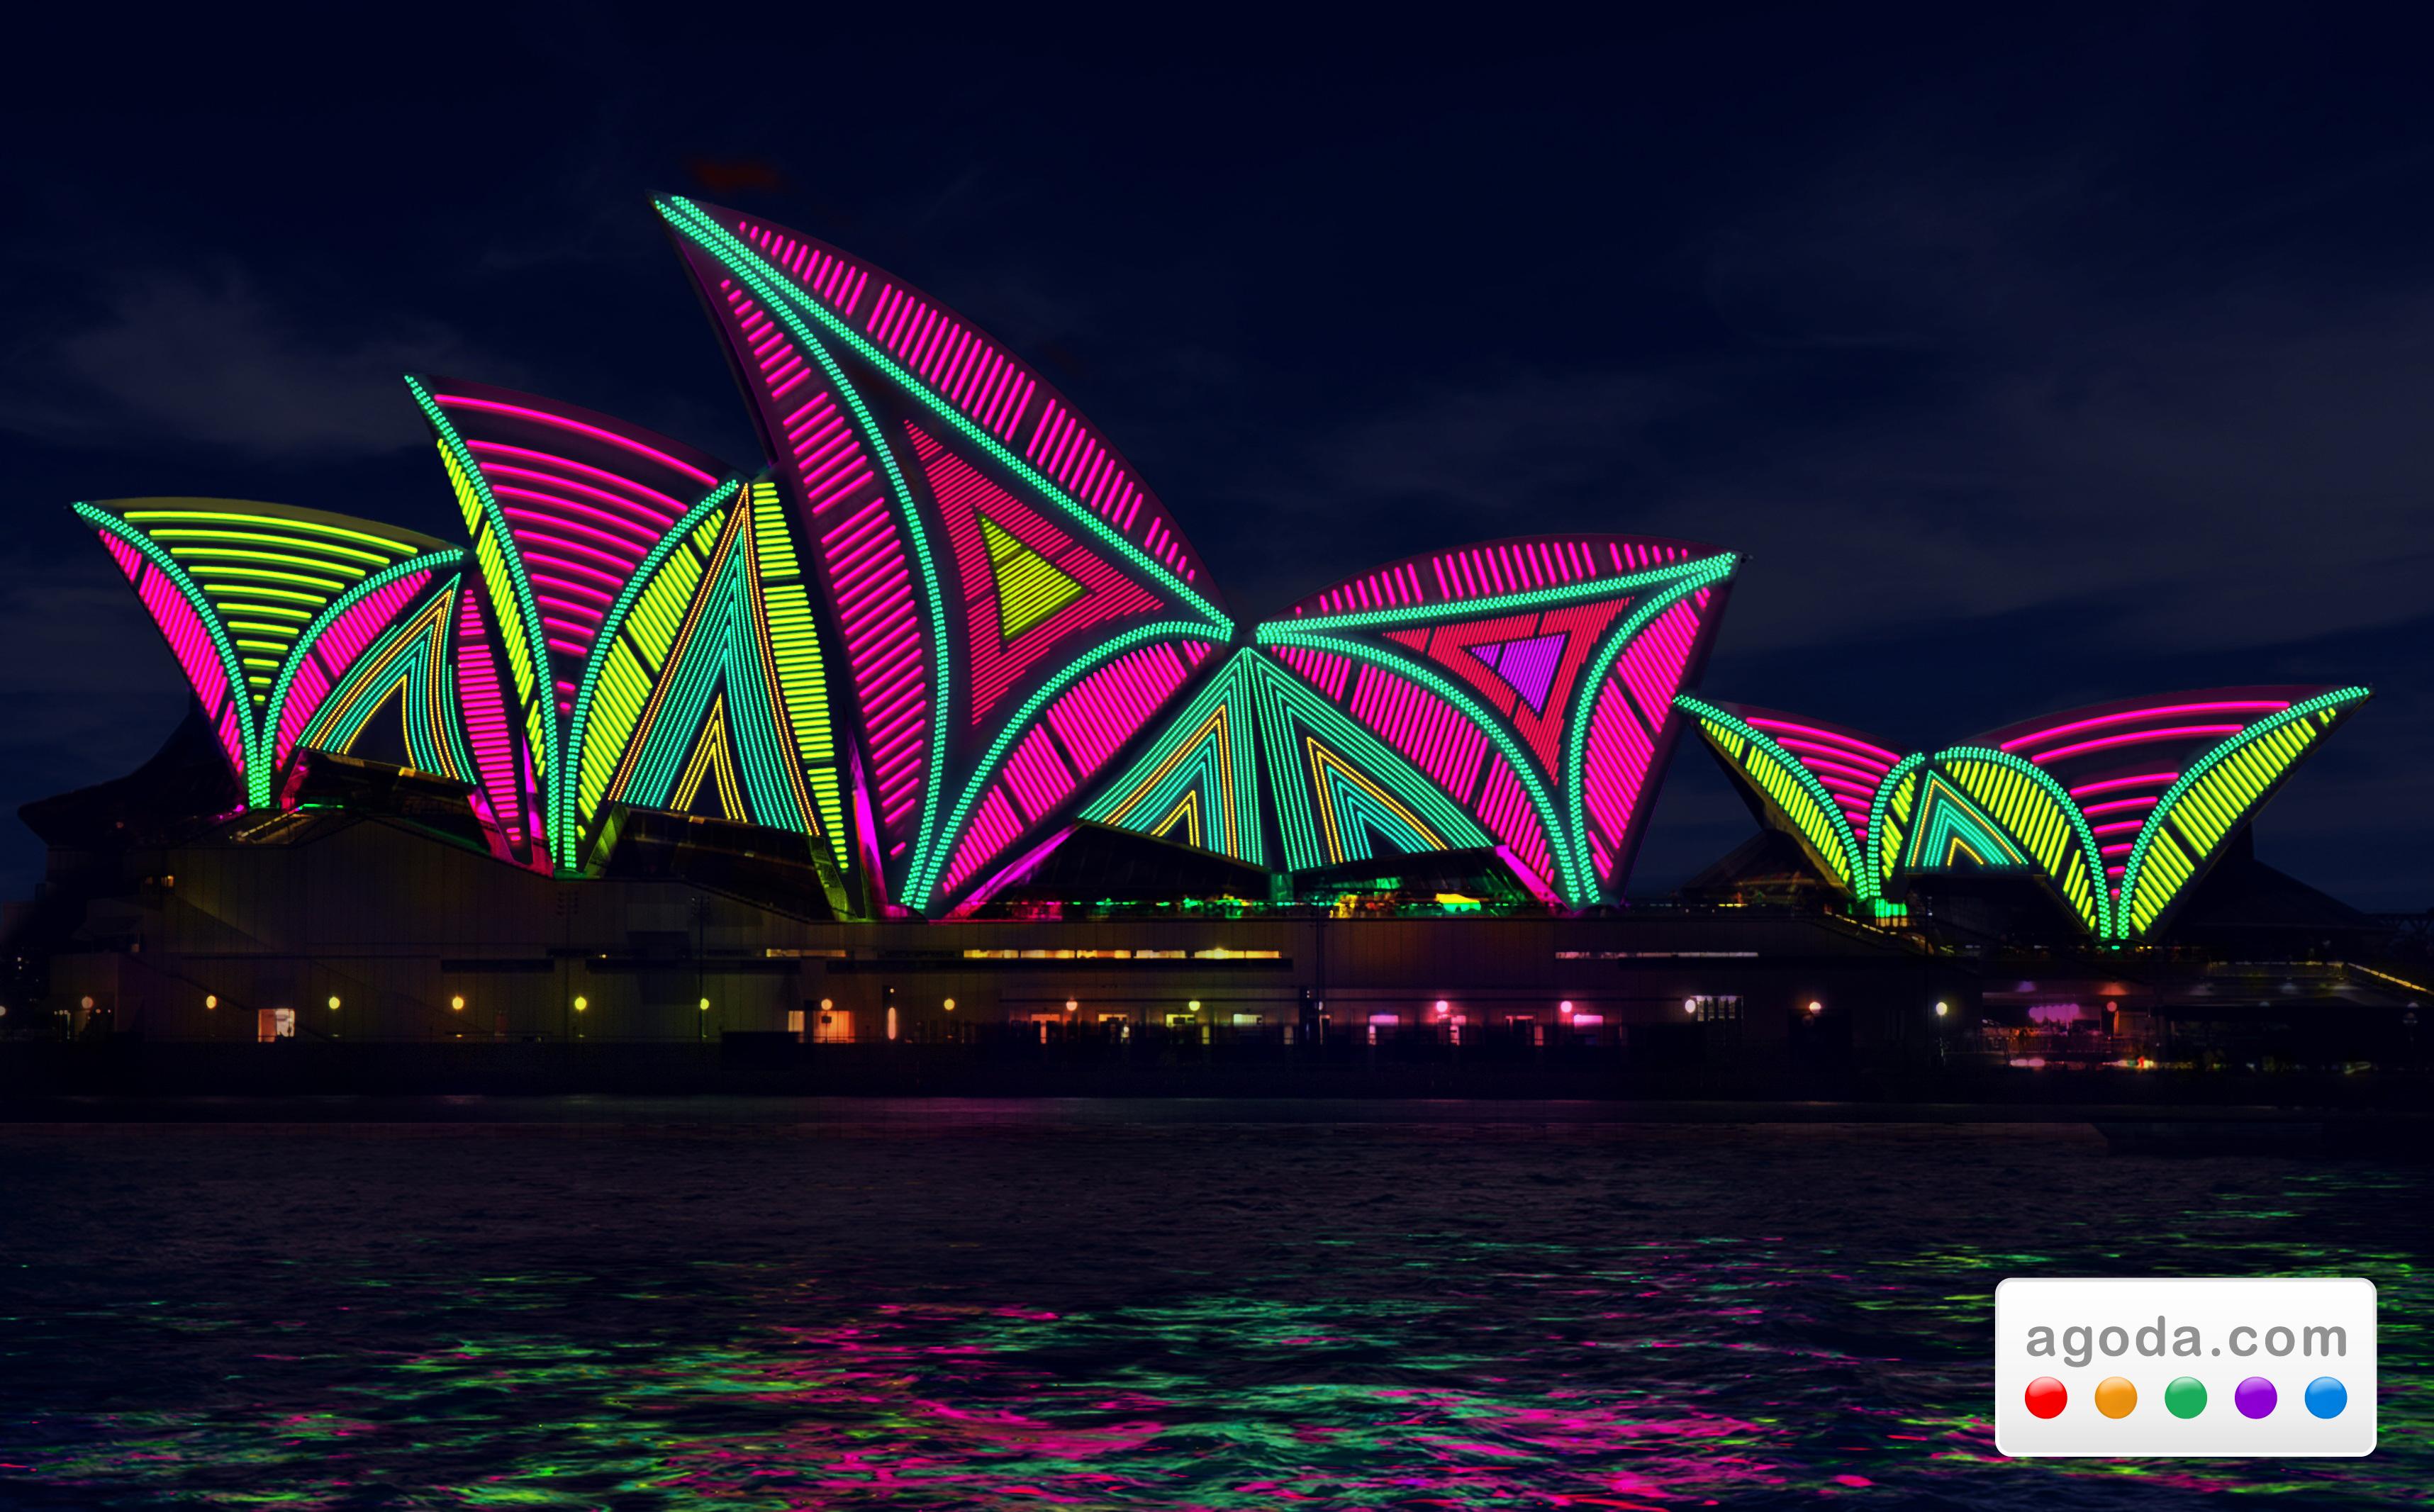 Agoda.comがビビッド シドニー フェスティバルに合わせてホテル大特価料金をスポットライトで彩る!